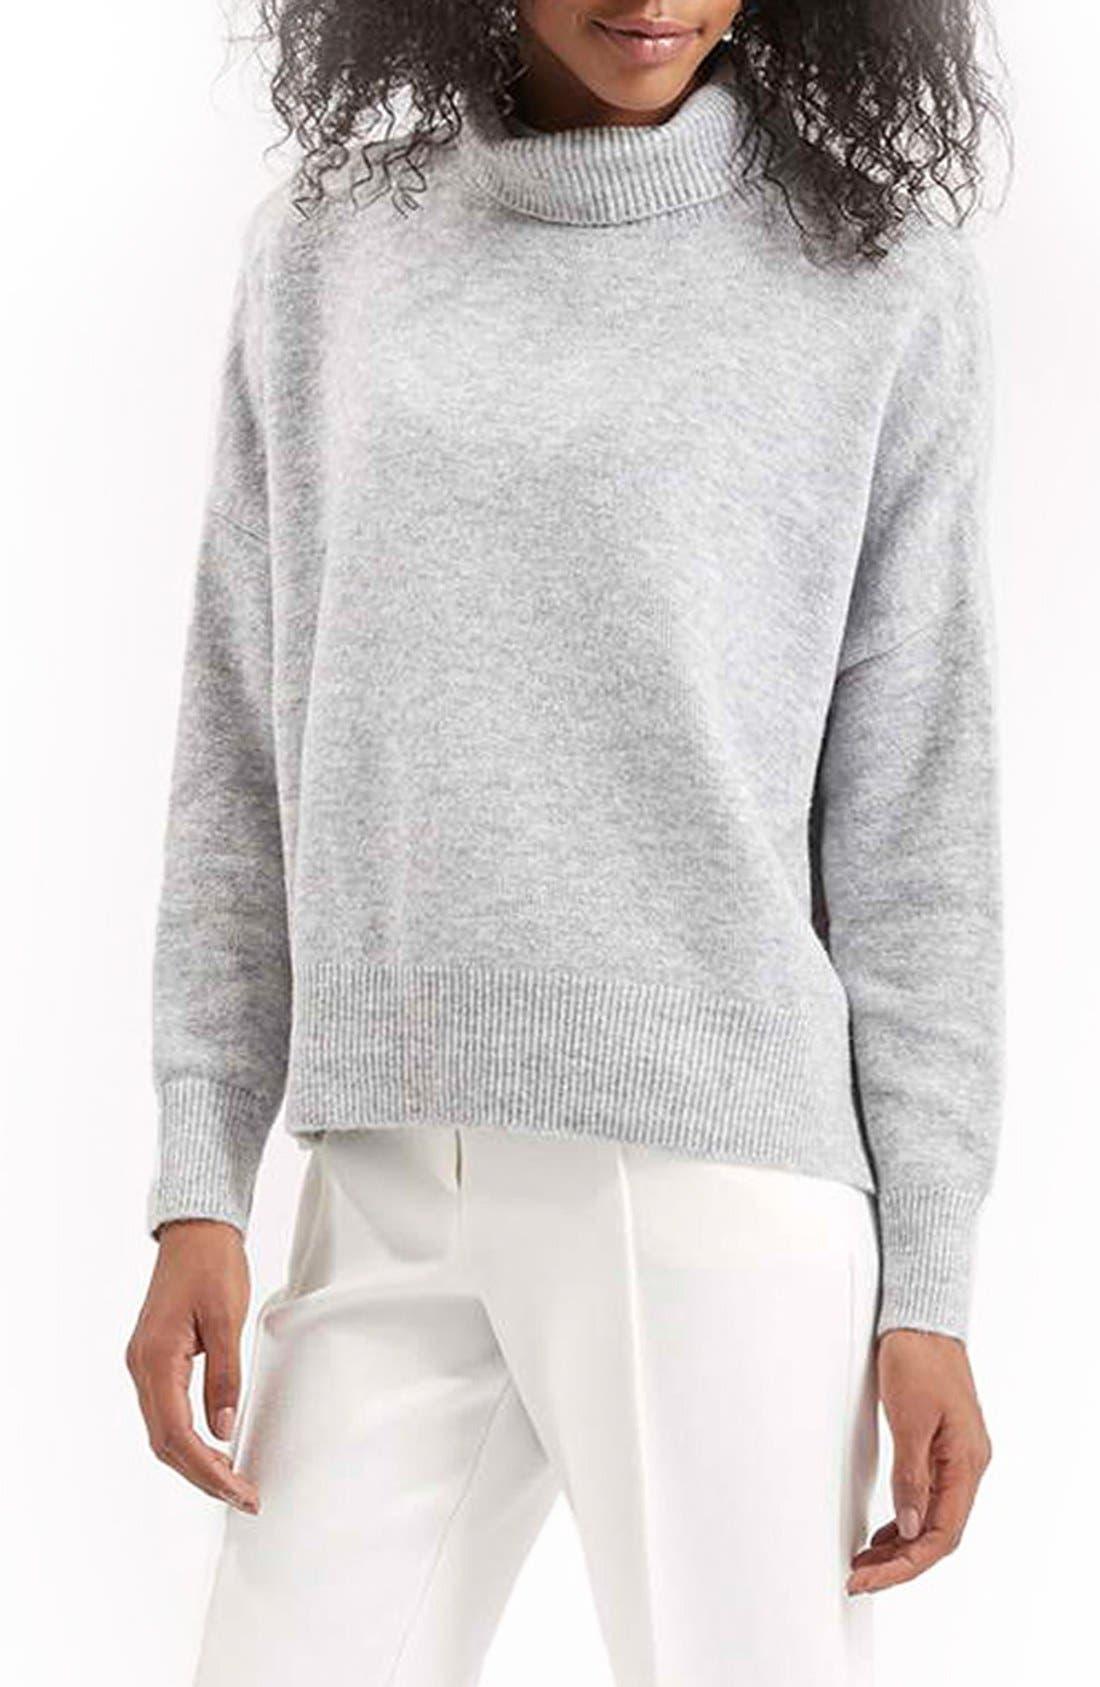 Alternate Image 1 Selected - TopshopBack Zip Turtleneck Sweater